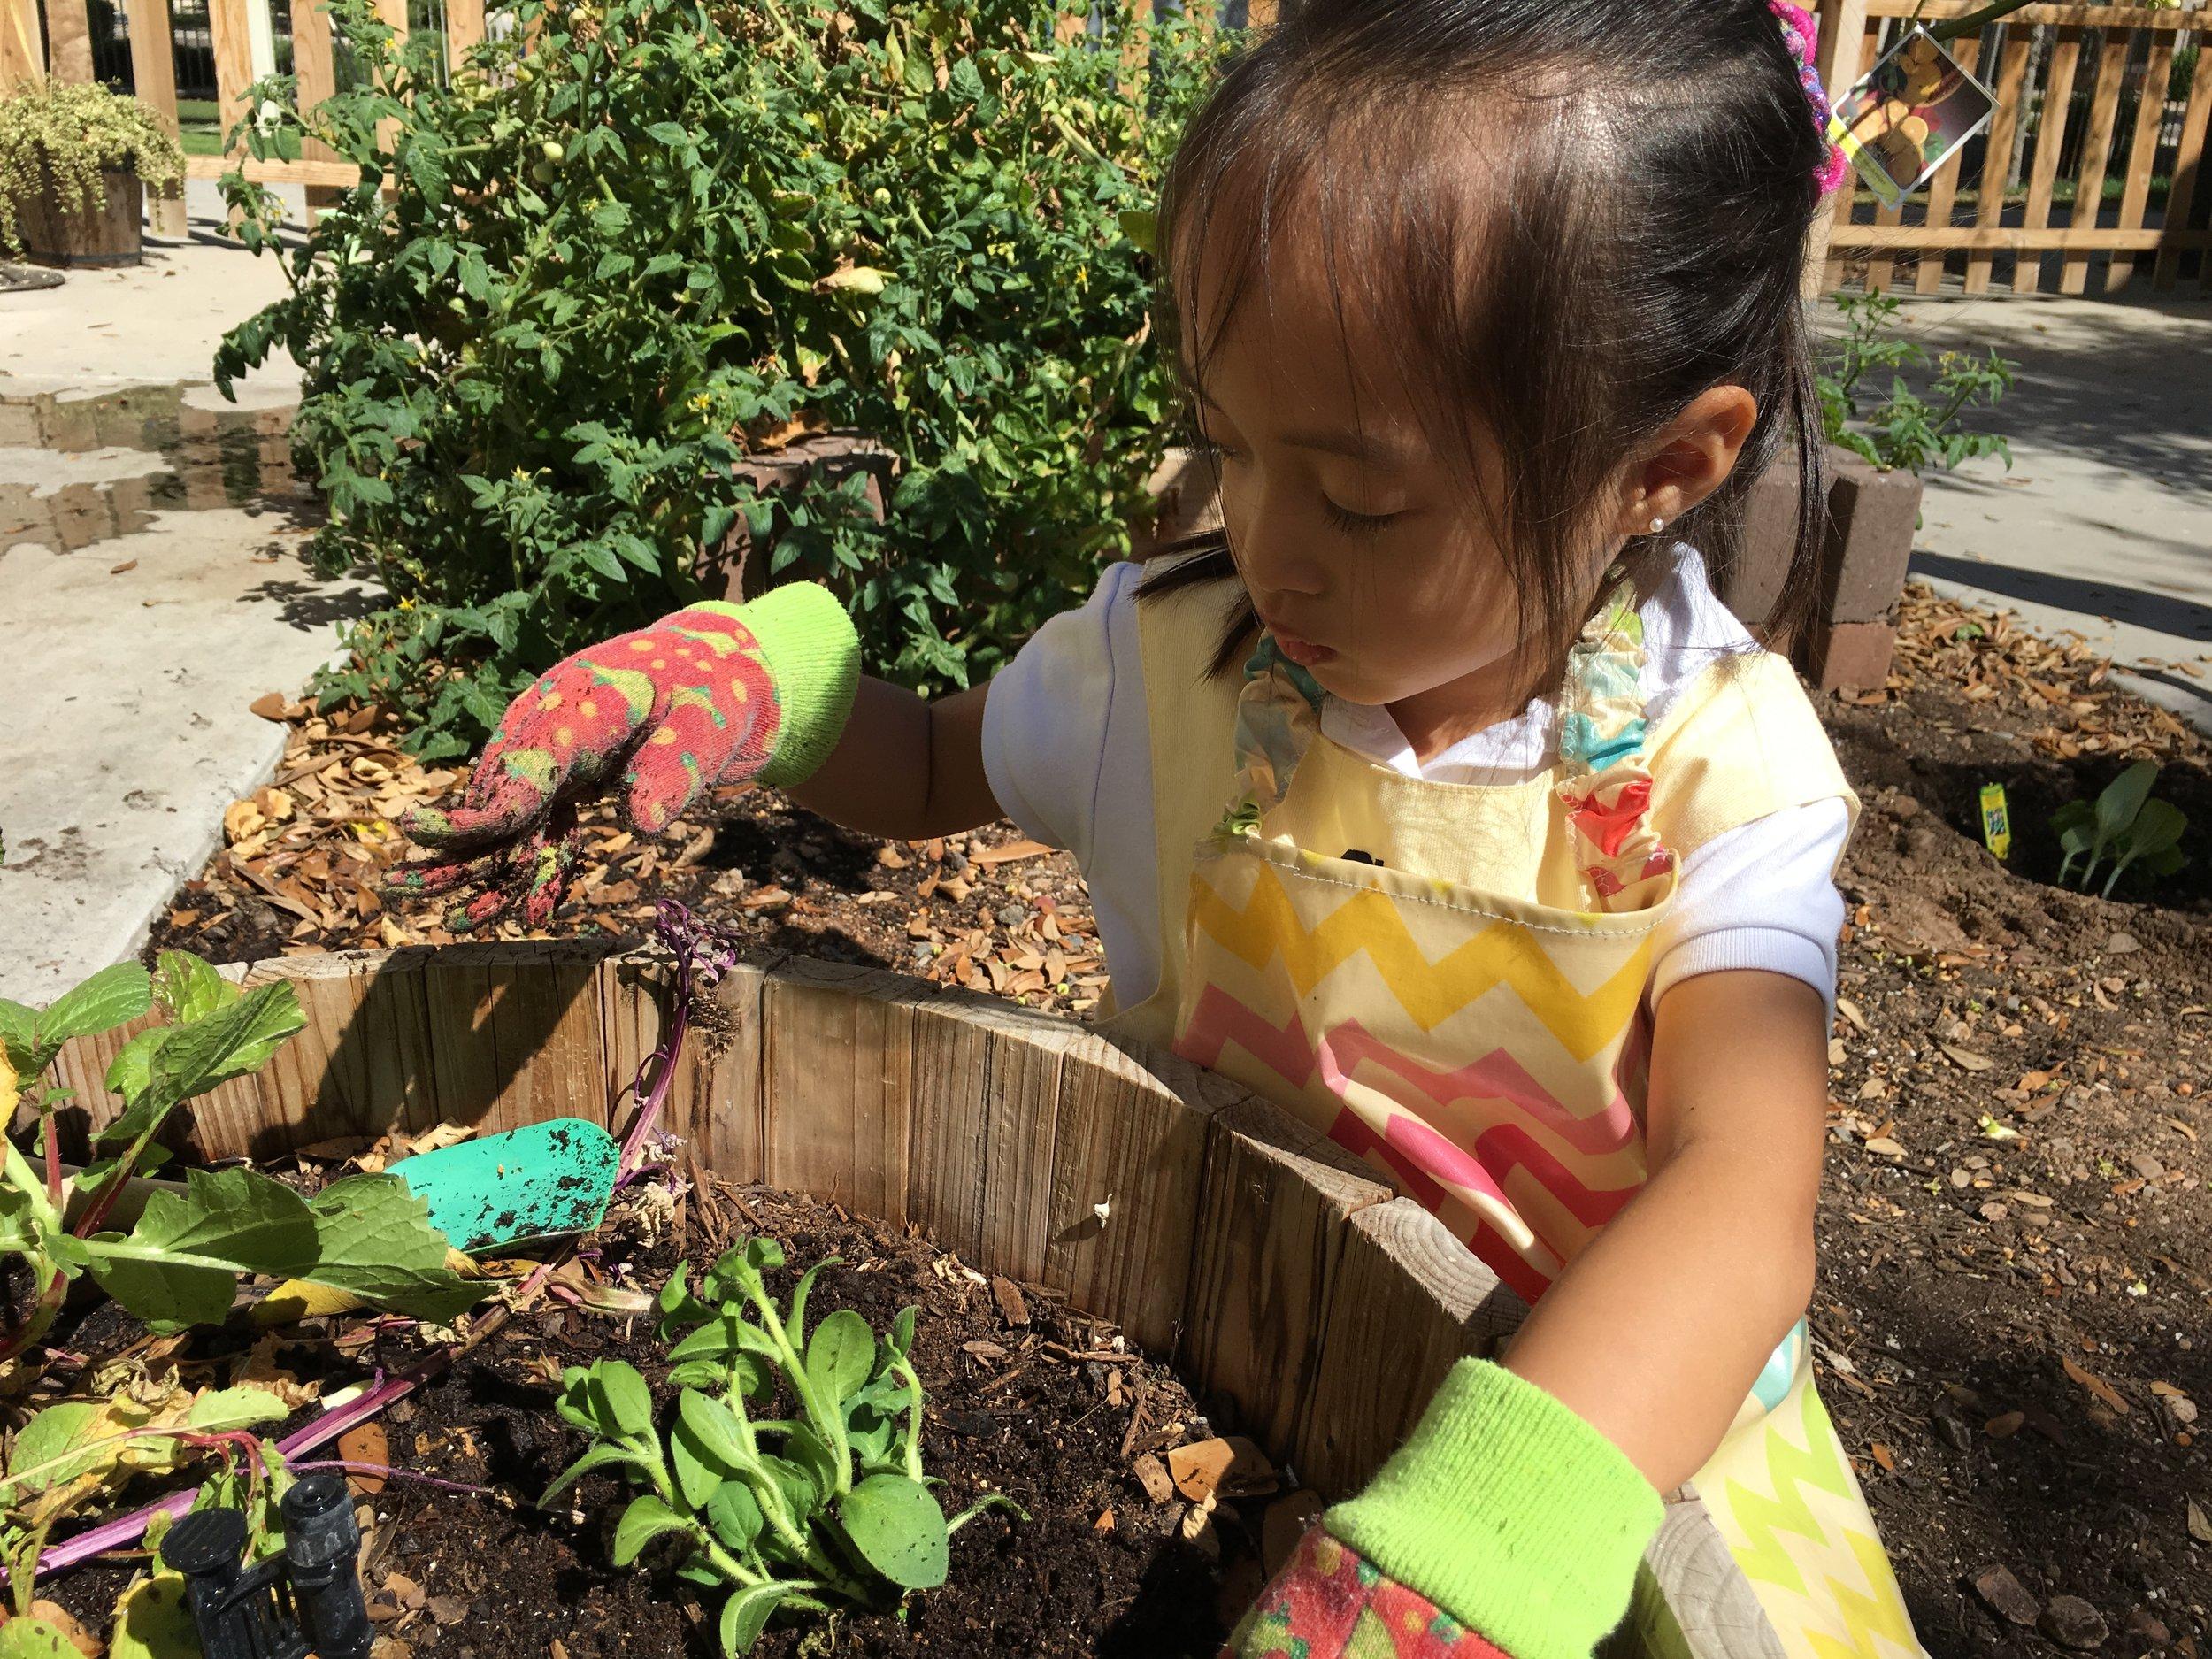 Planting a beautiful flower